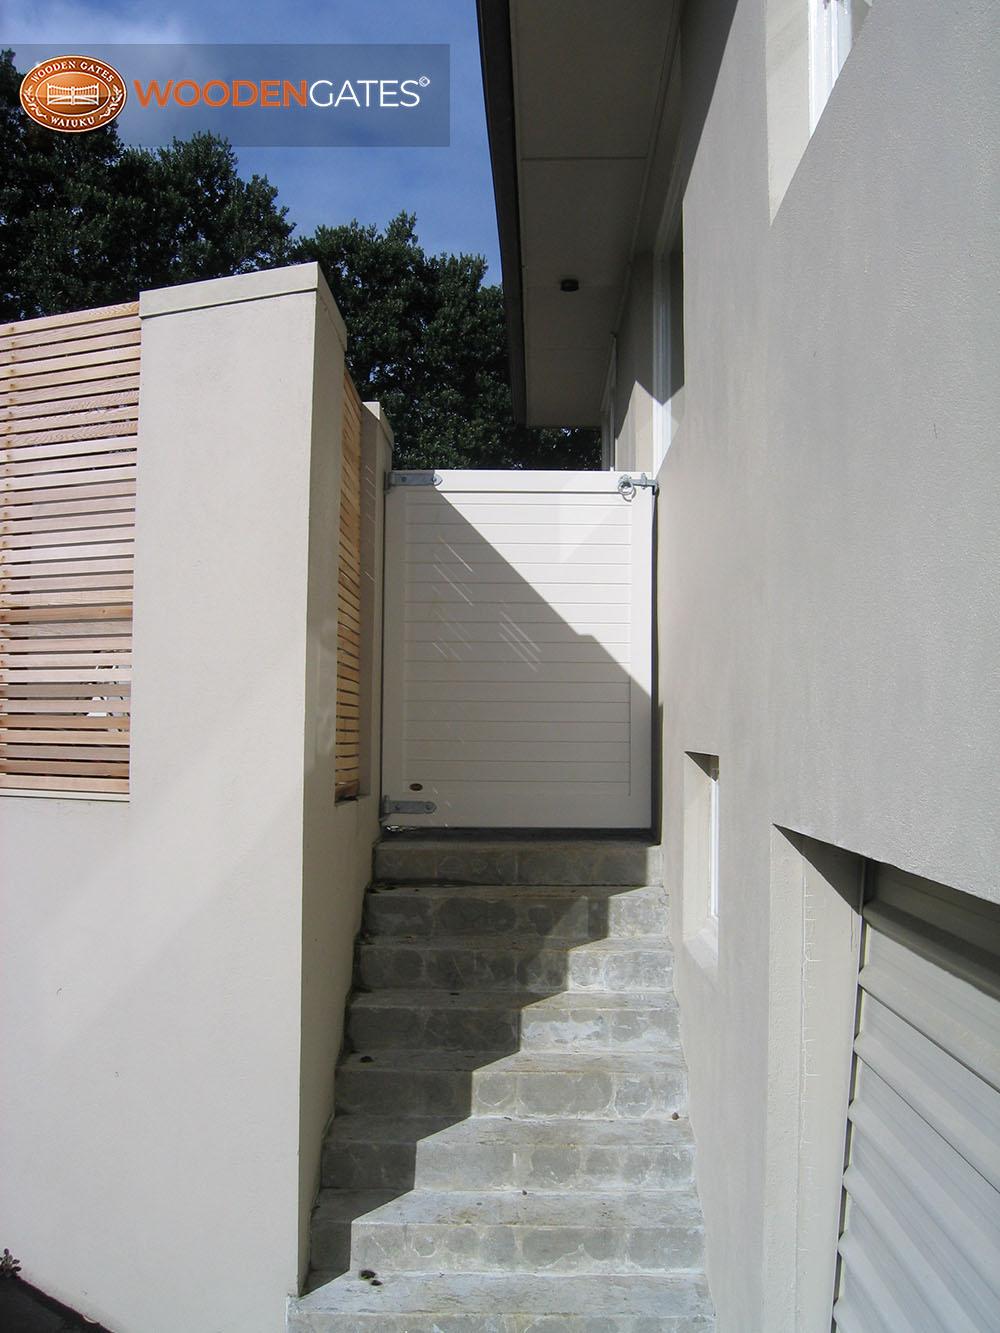 "#EU03- Painted pine pedestrian Euro<br /><span>Euro 03</span><br /><a href=""/enquiry/?about=EU03- Painted pine pedestrian Euro"">ENQUIRE ABOUT THIS >></a><br /><a href=""#""  data-id=""https://woodengates2-px.rtrk.co.nz/i/CityGates/GCIPP3954.JPG"" class=""print-this-image"">PRINT THIS IMAGE >></a><span class=""ug-icon-favorite "" data-id=""2115"" id=""spanFavorite2115"" title=""Add to My list""></span>"